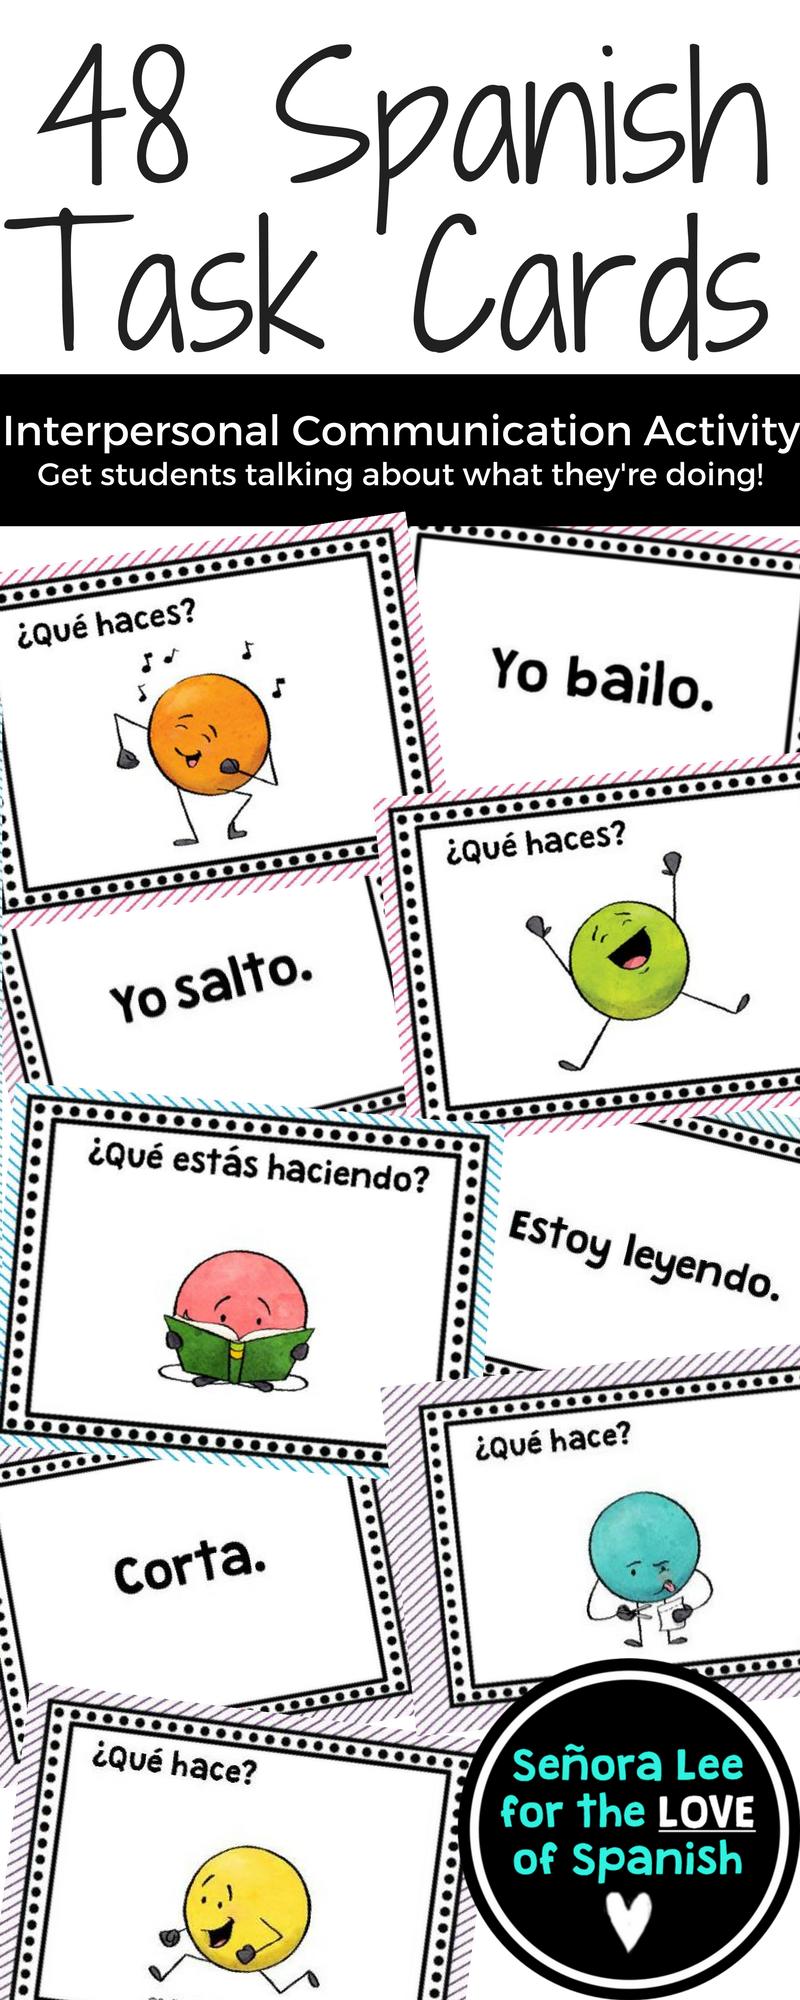 Spanish Verbs Task Cards - Present Tense Verbs, Present Progressive, Emotions #spanishthings